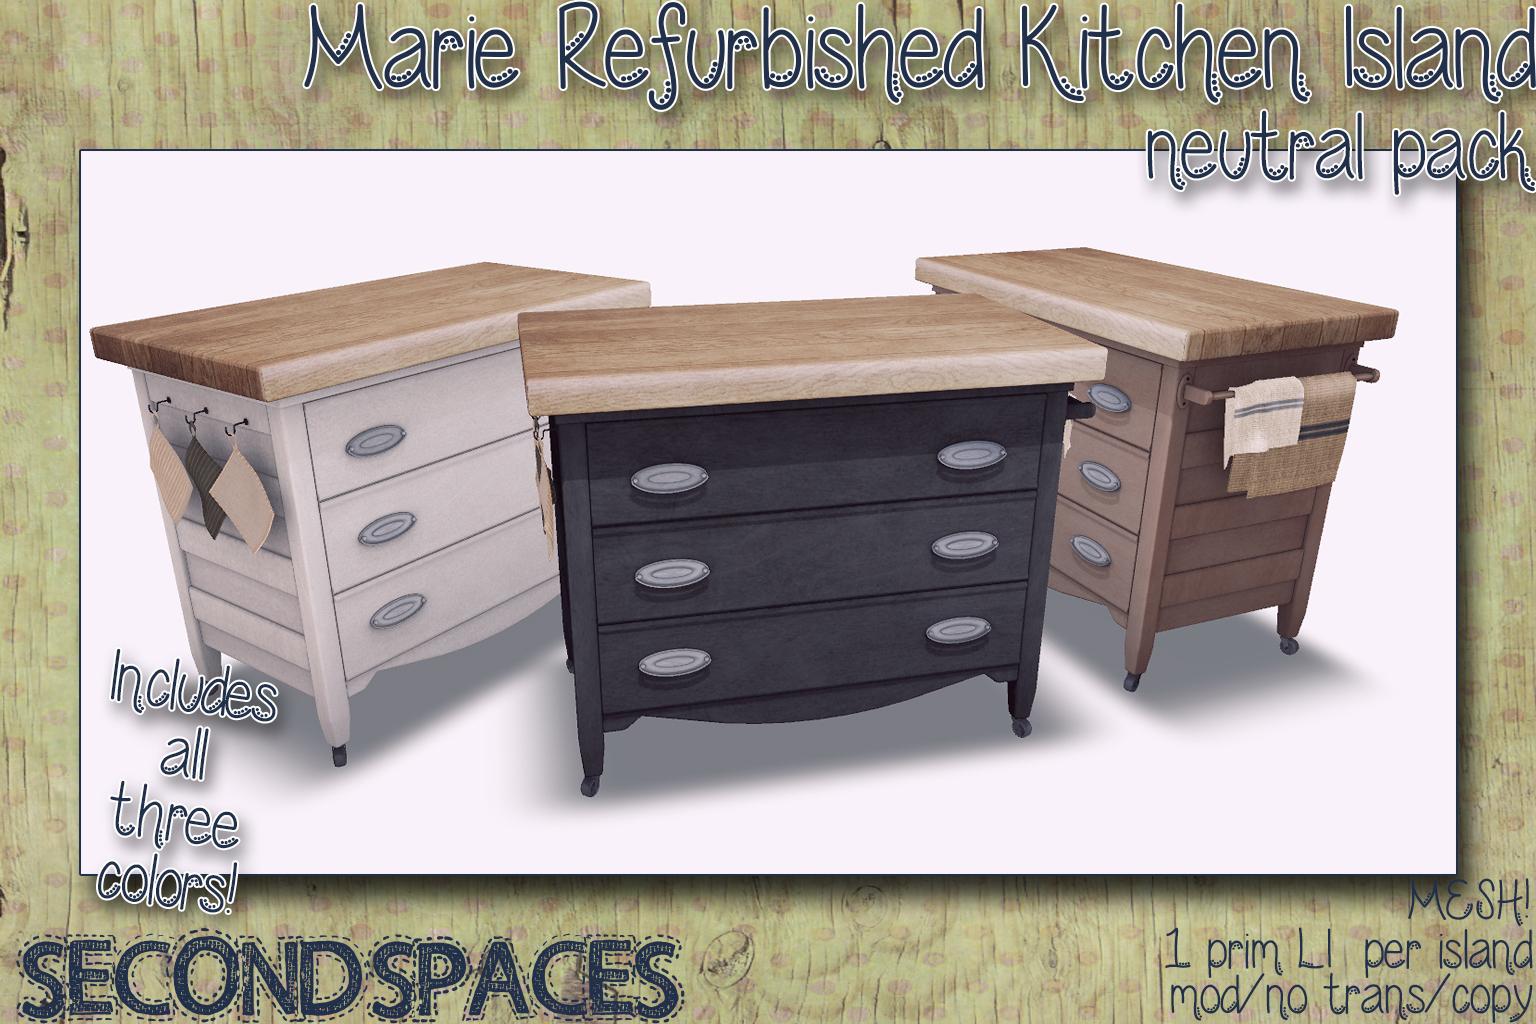 marie refurb kitch island_neutral_vendor.jpg